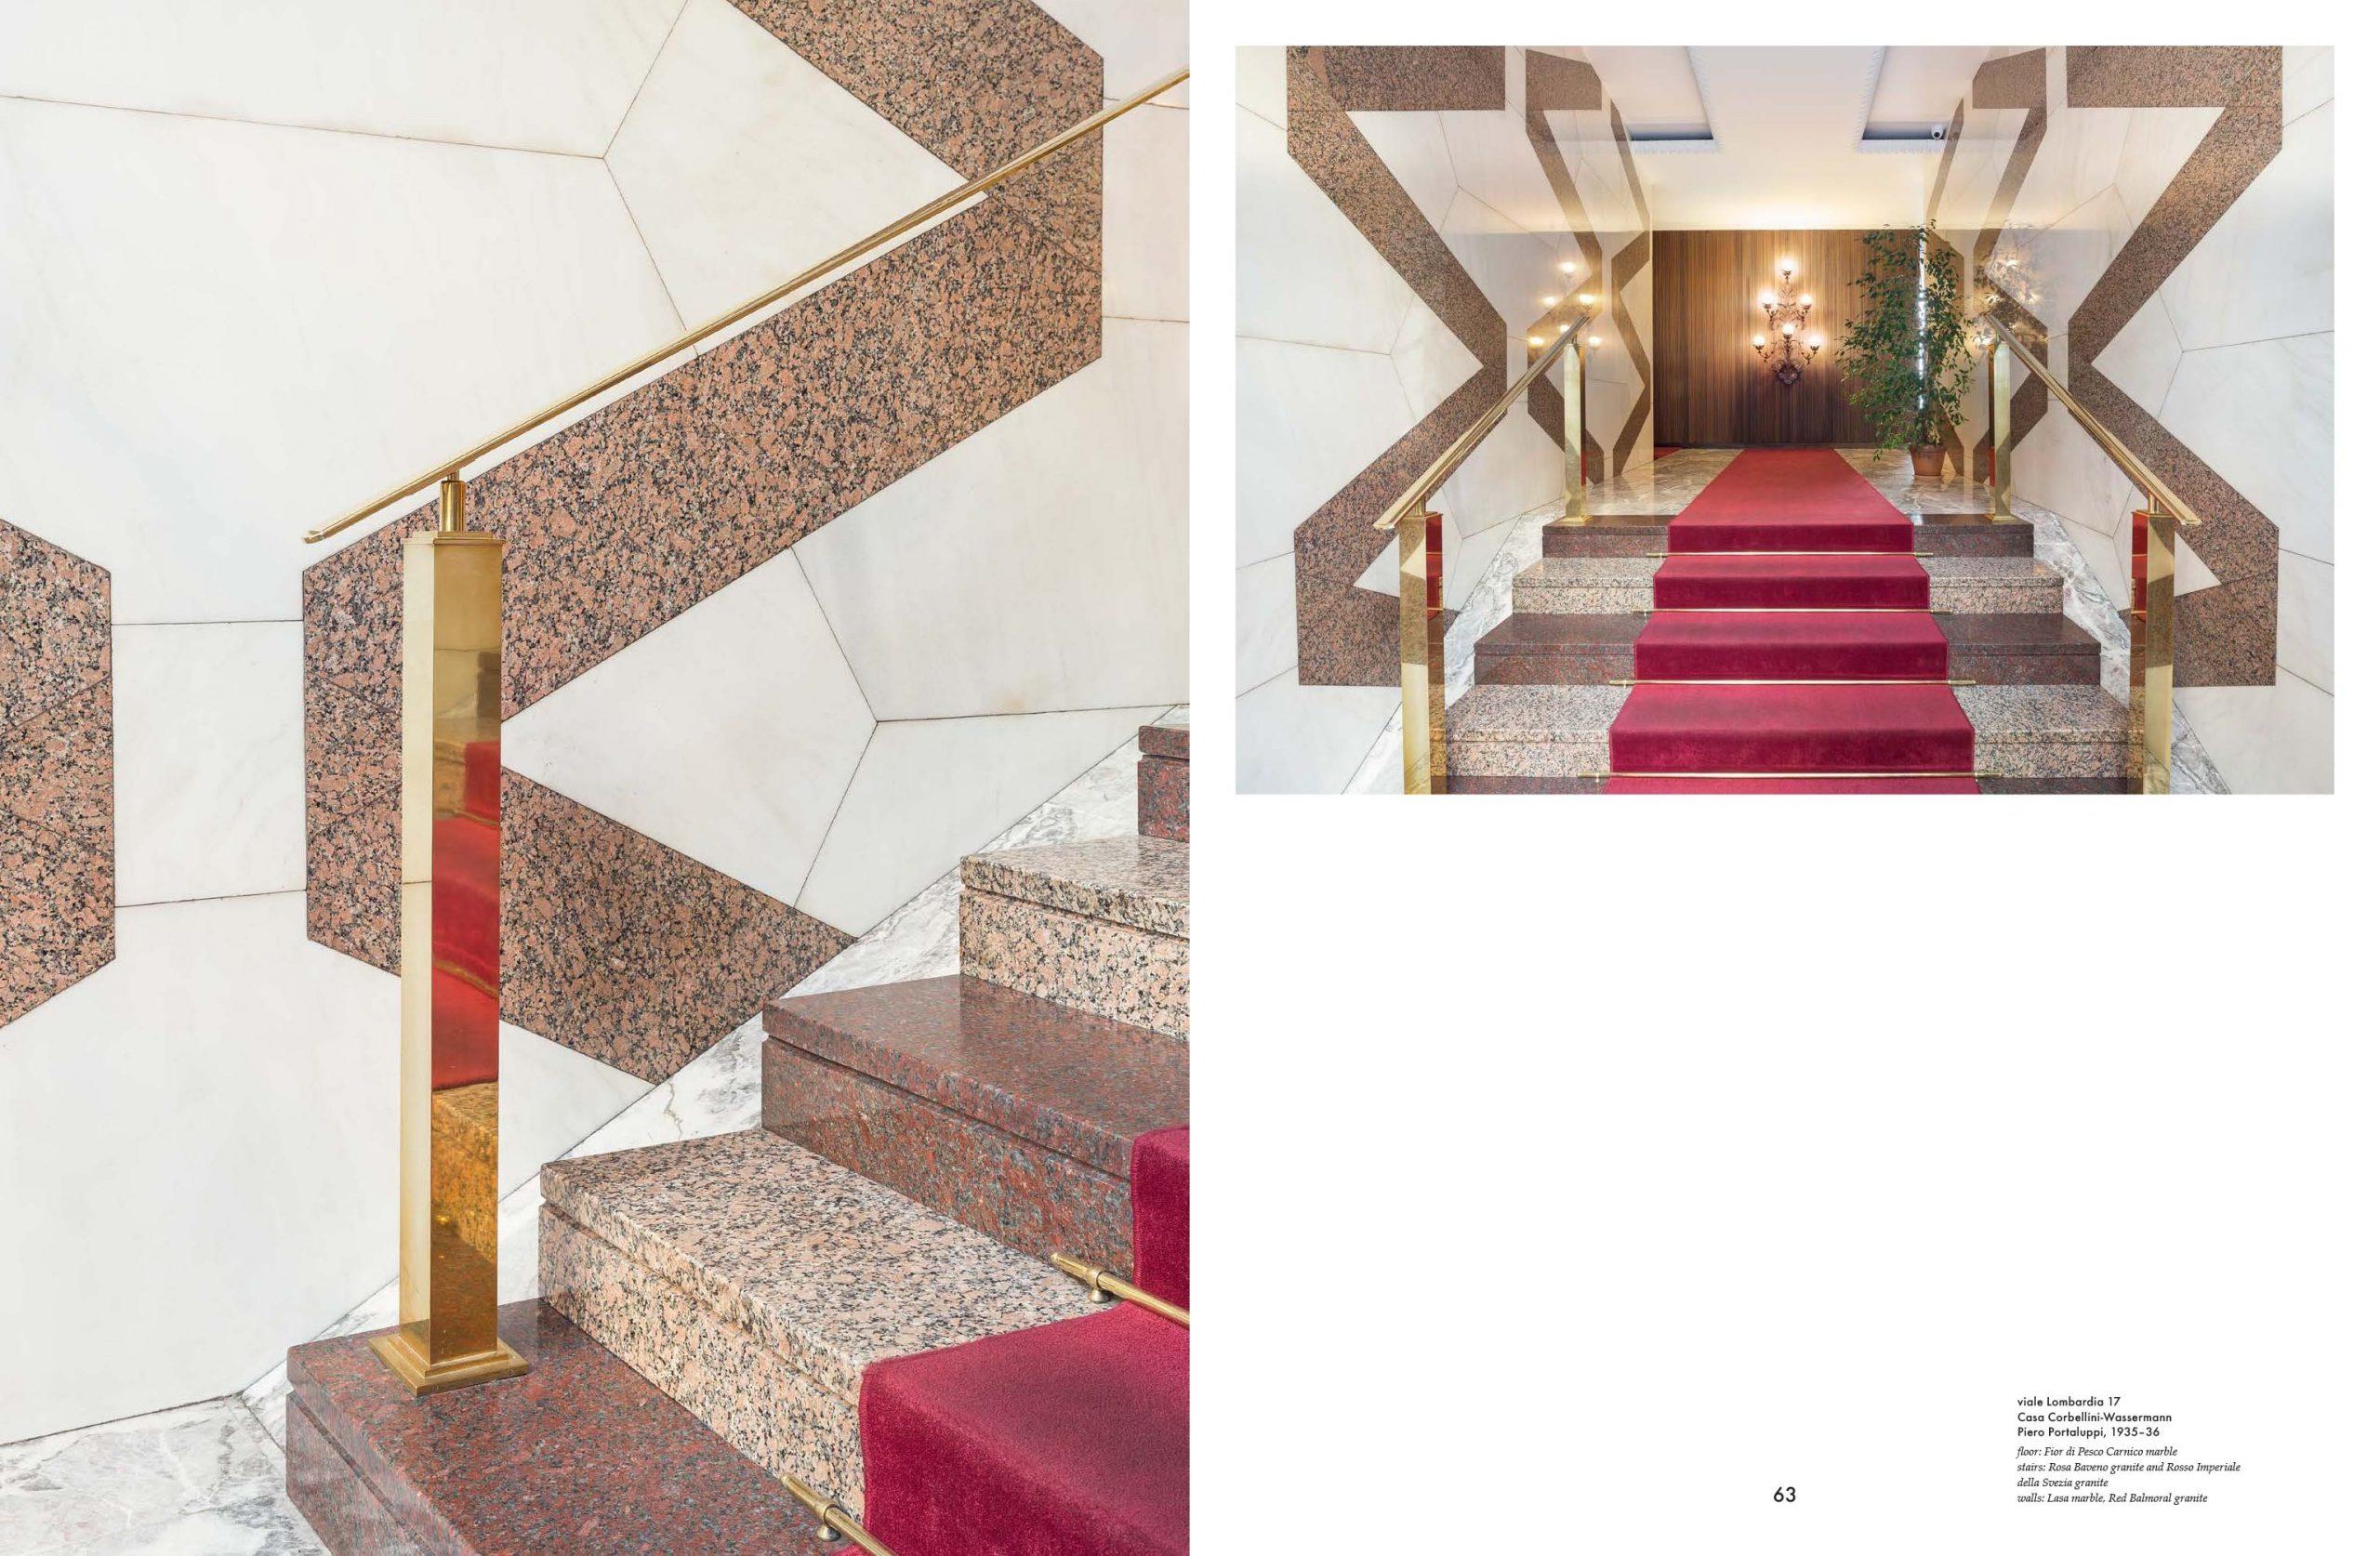 nicoletta-dalfino-karl-kolbitz-entryways-of-milan-taschen-pp62-63-scaled